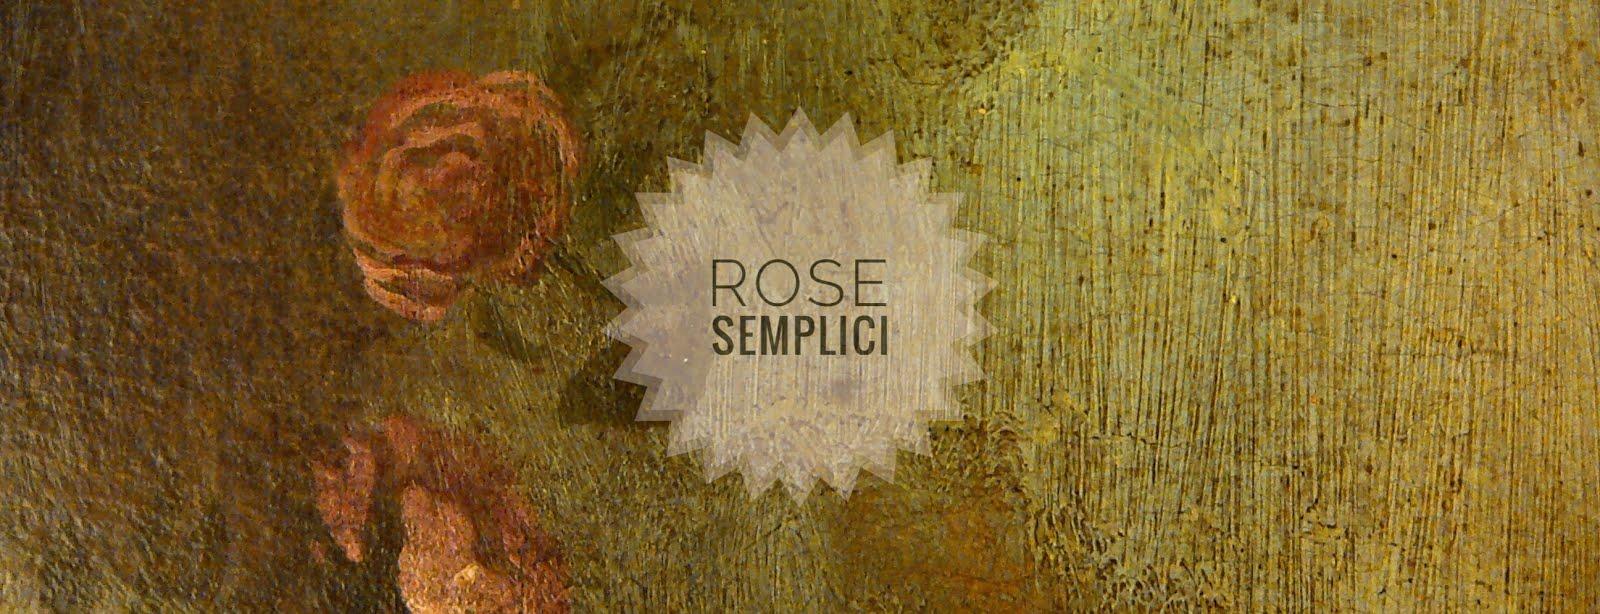 Rose semplici